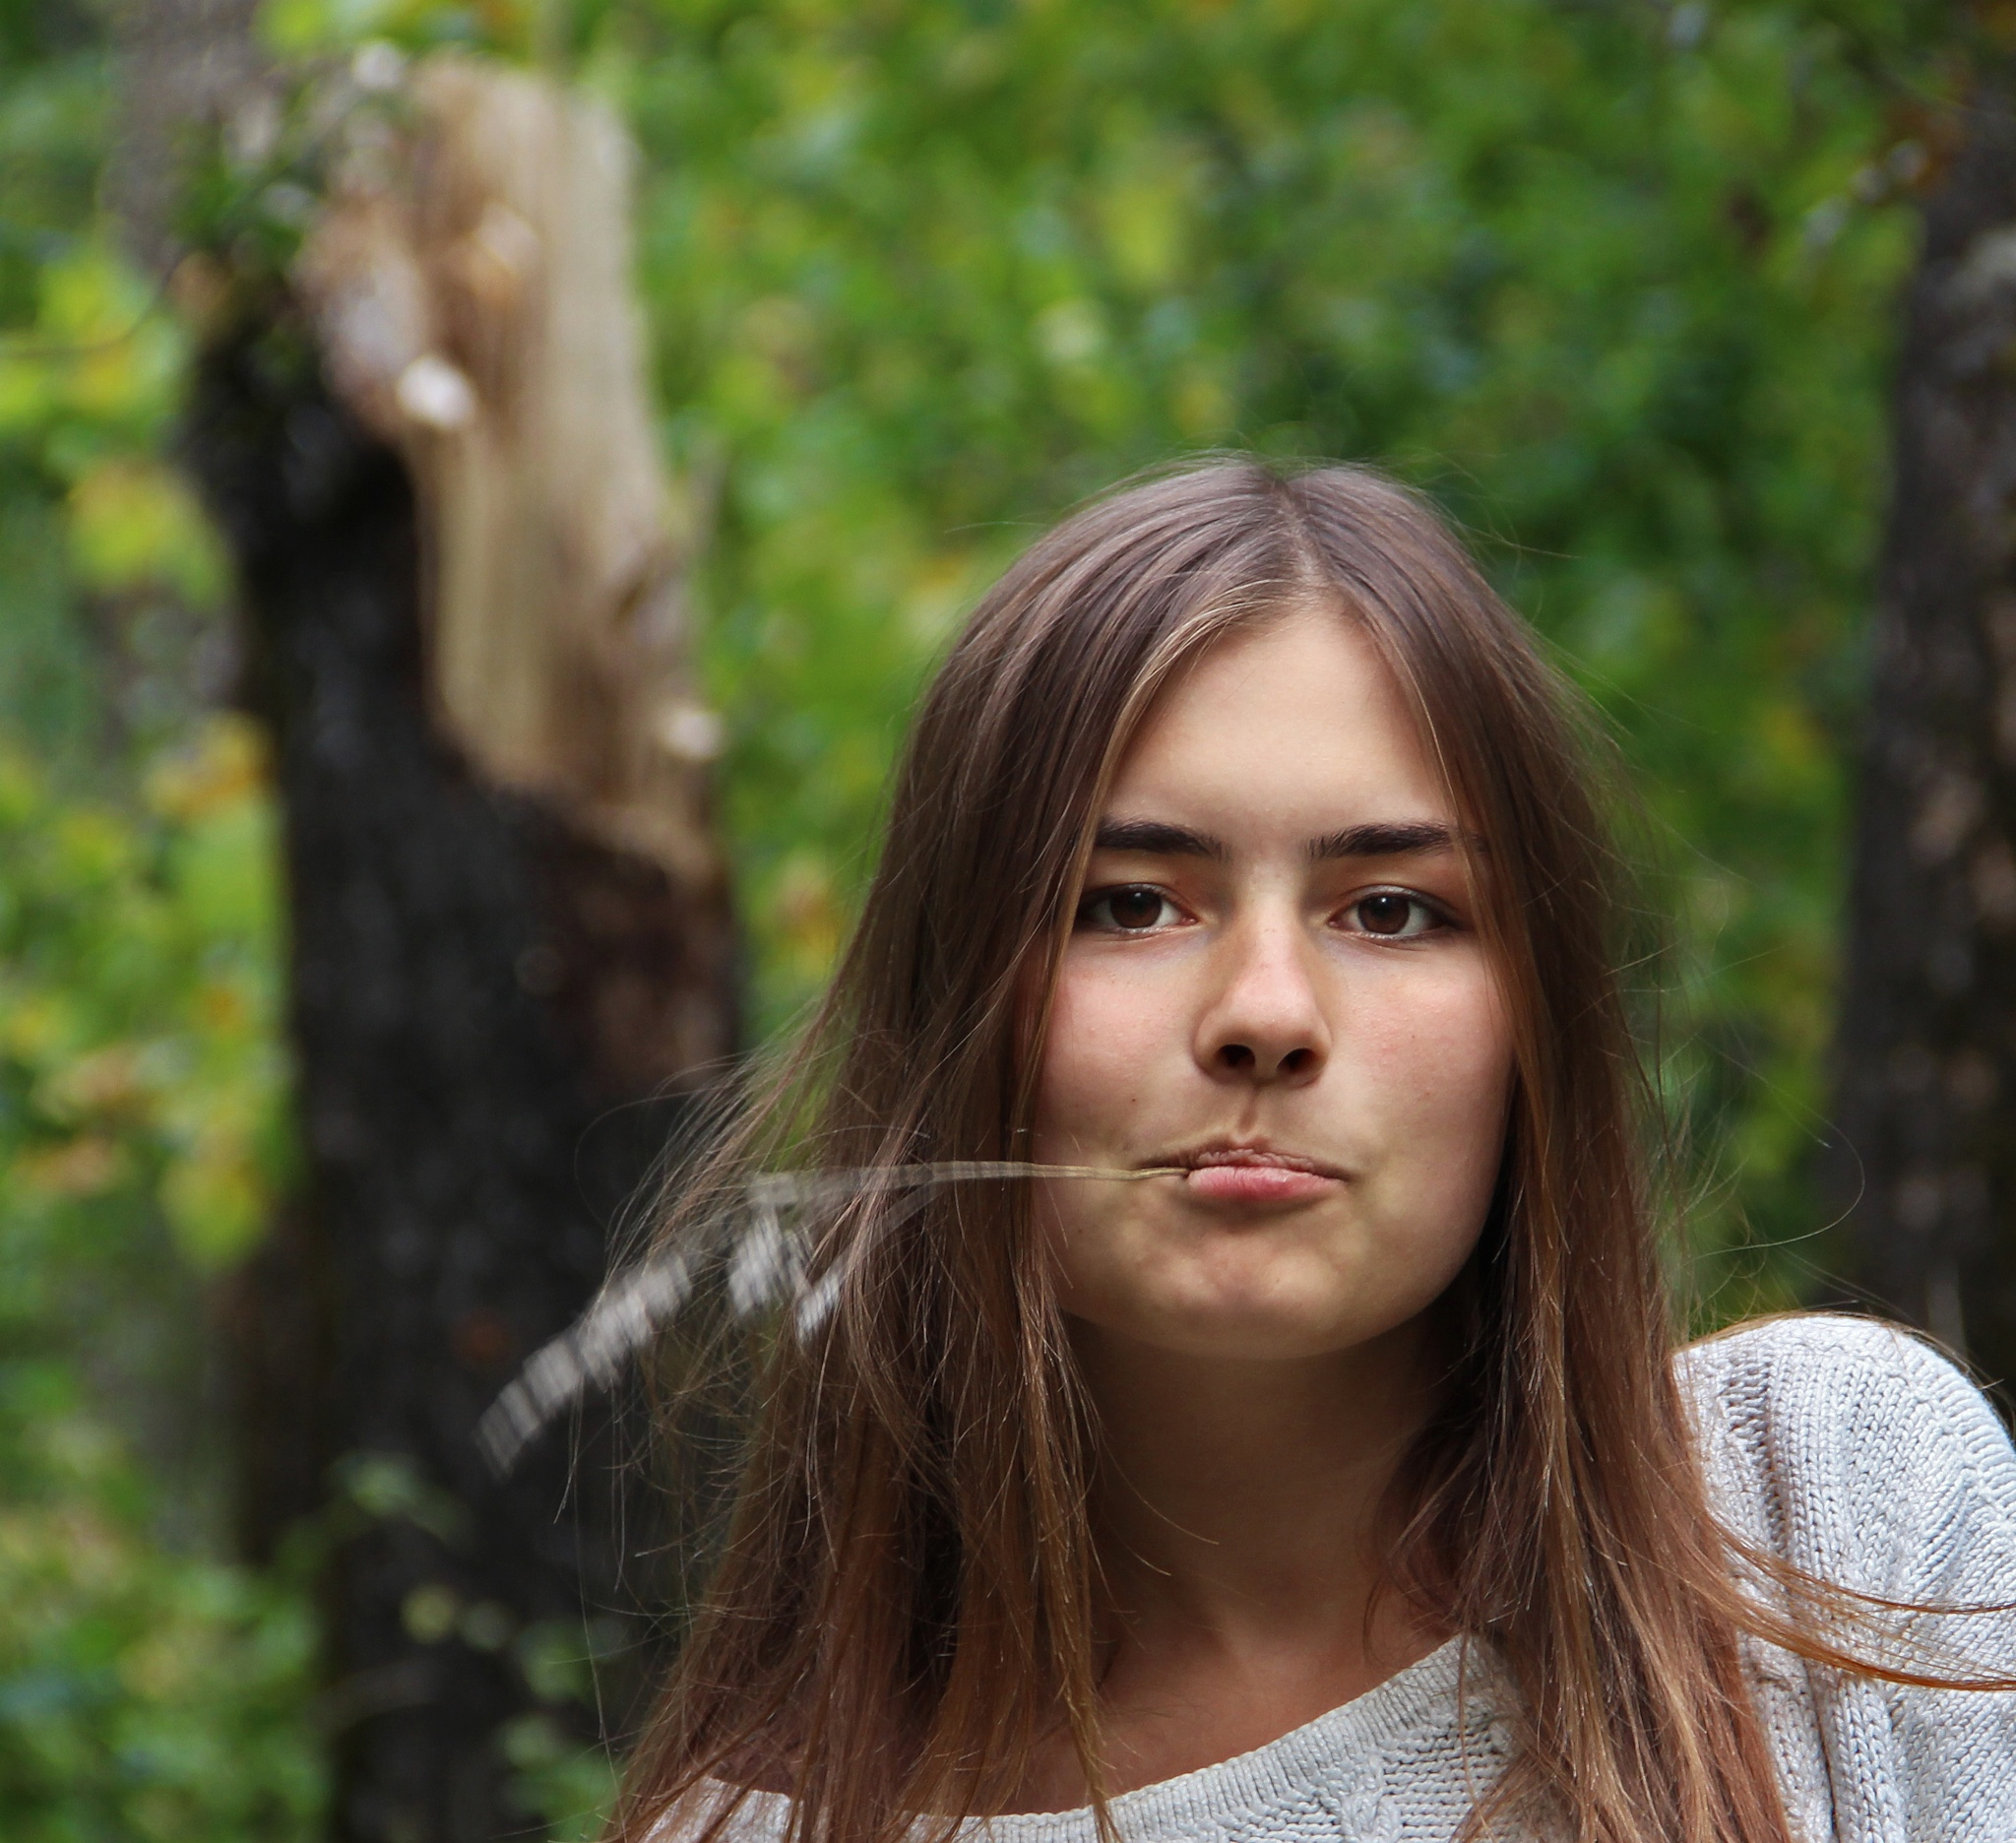 Yuliya in the forest by Сергей Юрьев